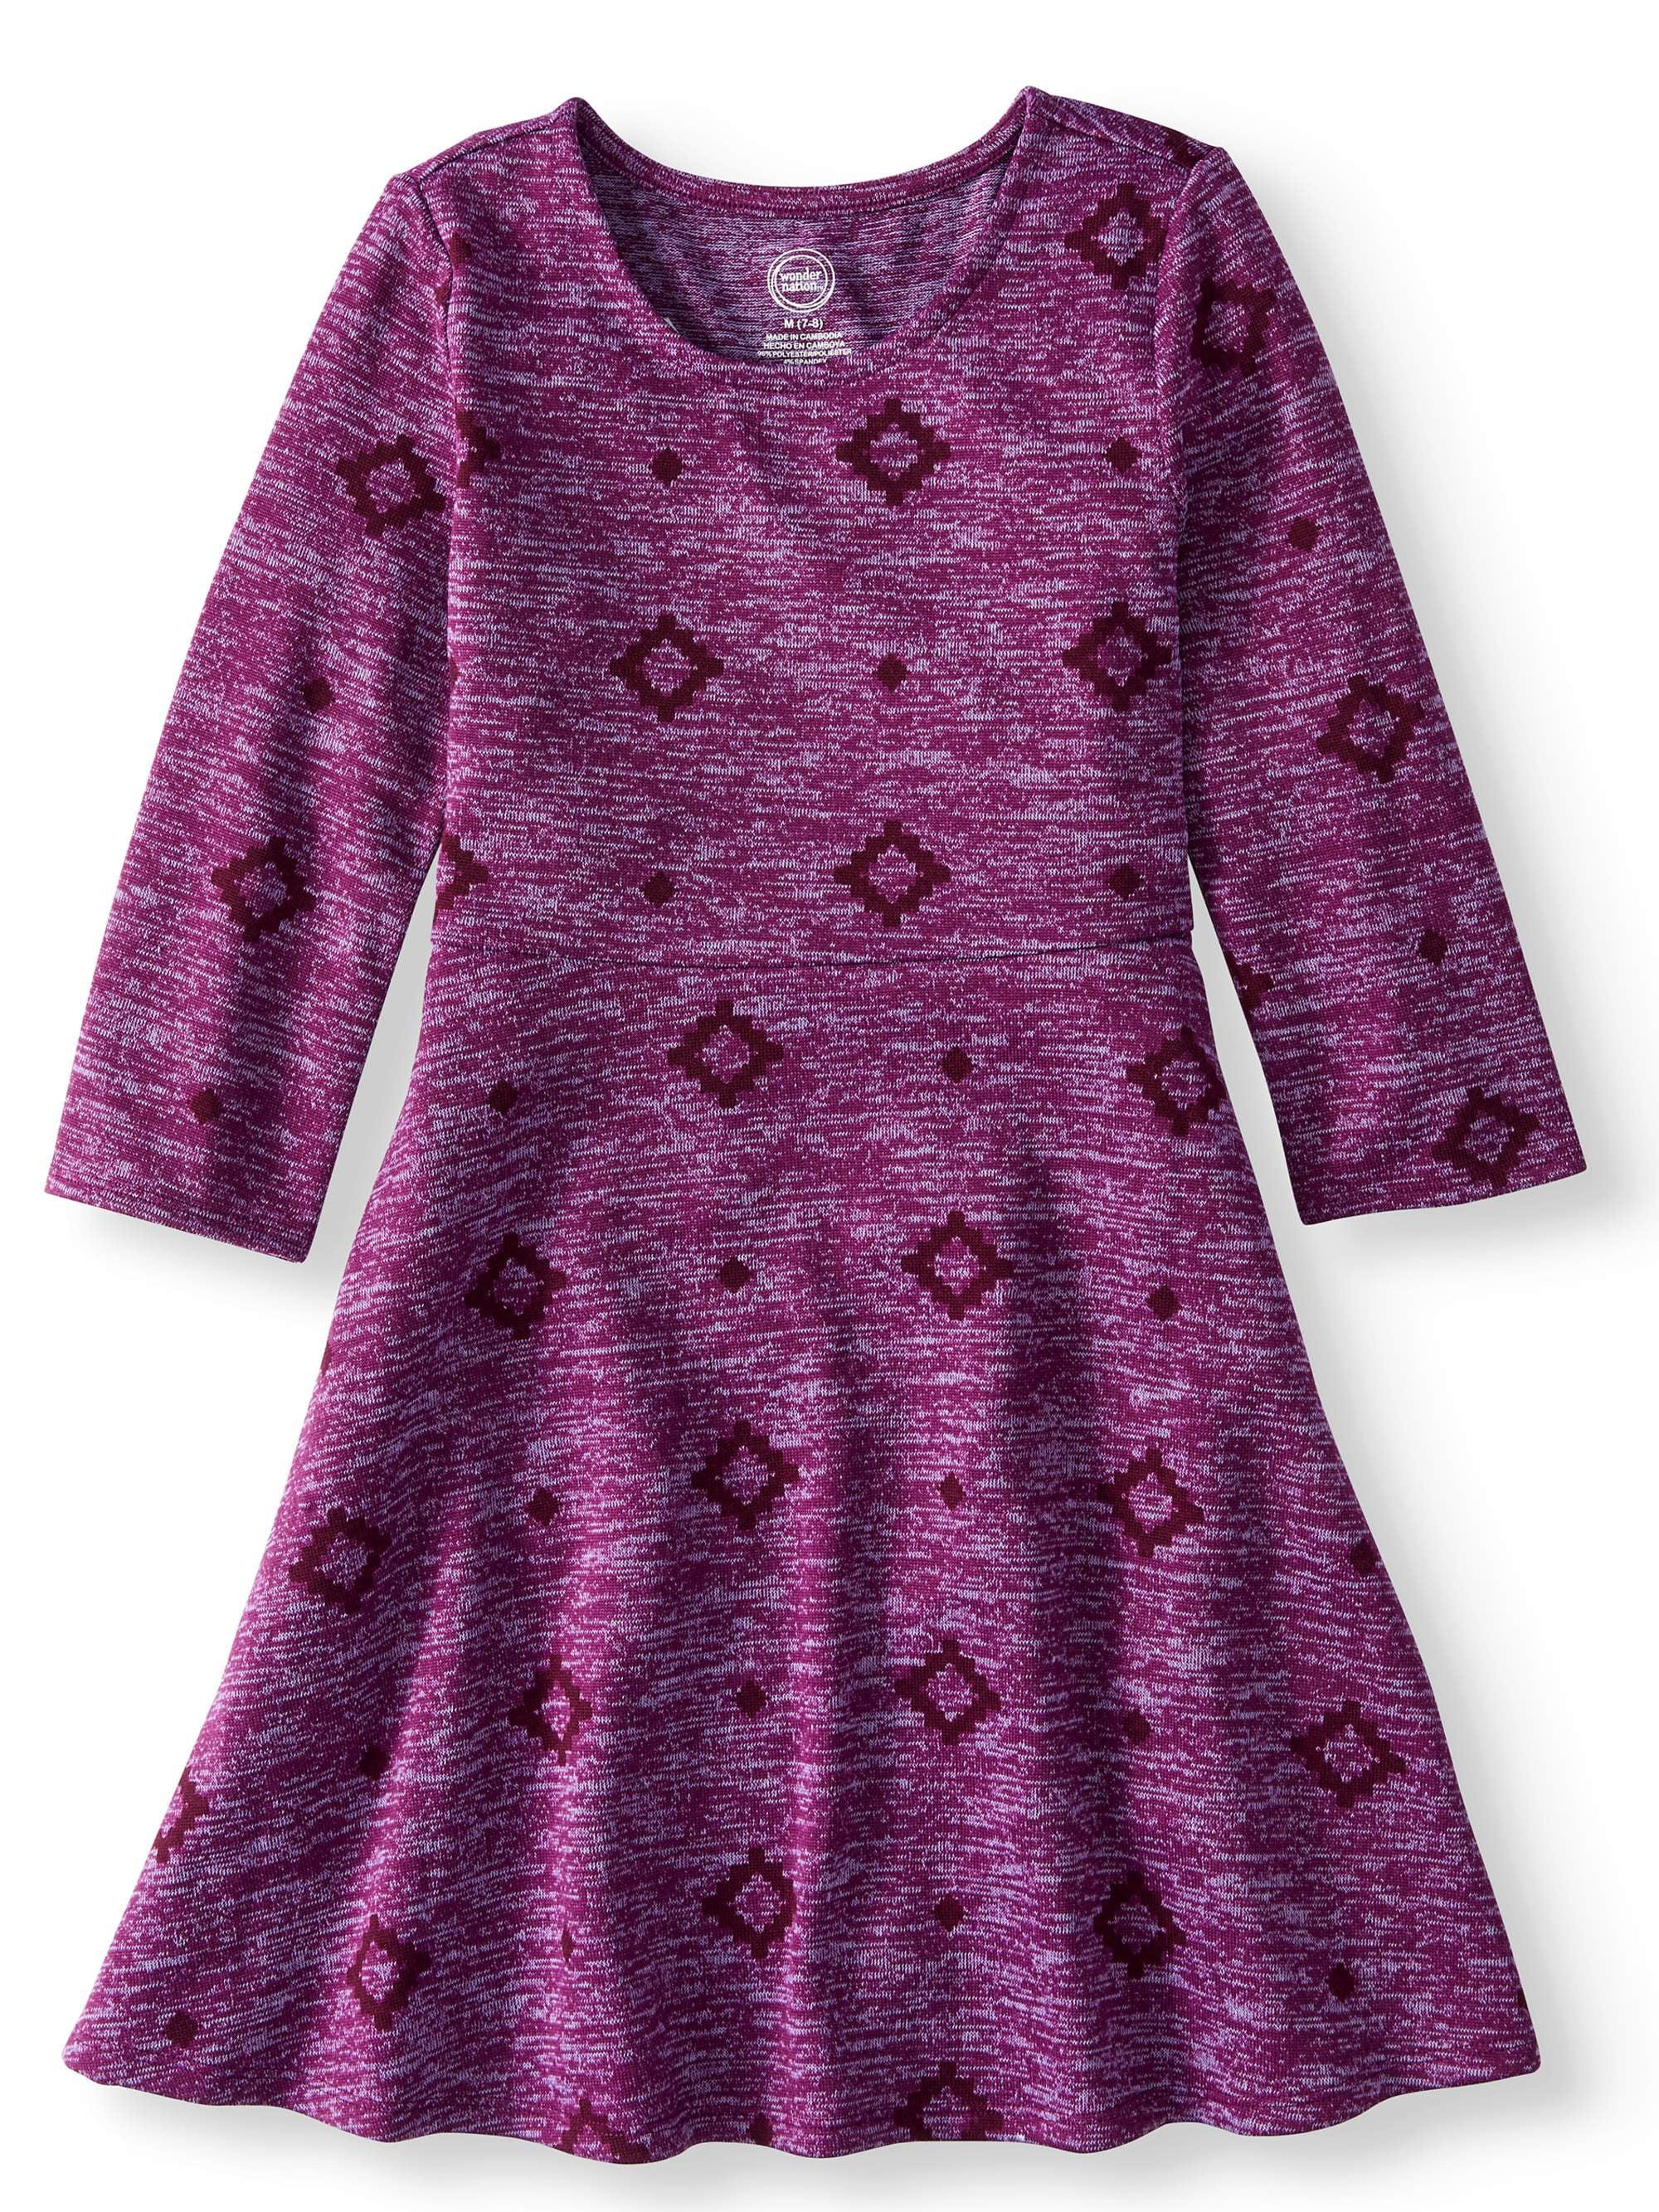 Printed Long Sleeve Sweater Knit Dress (Little Girls and Big Girls)